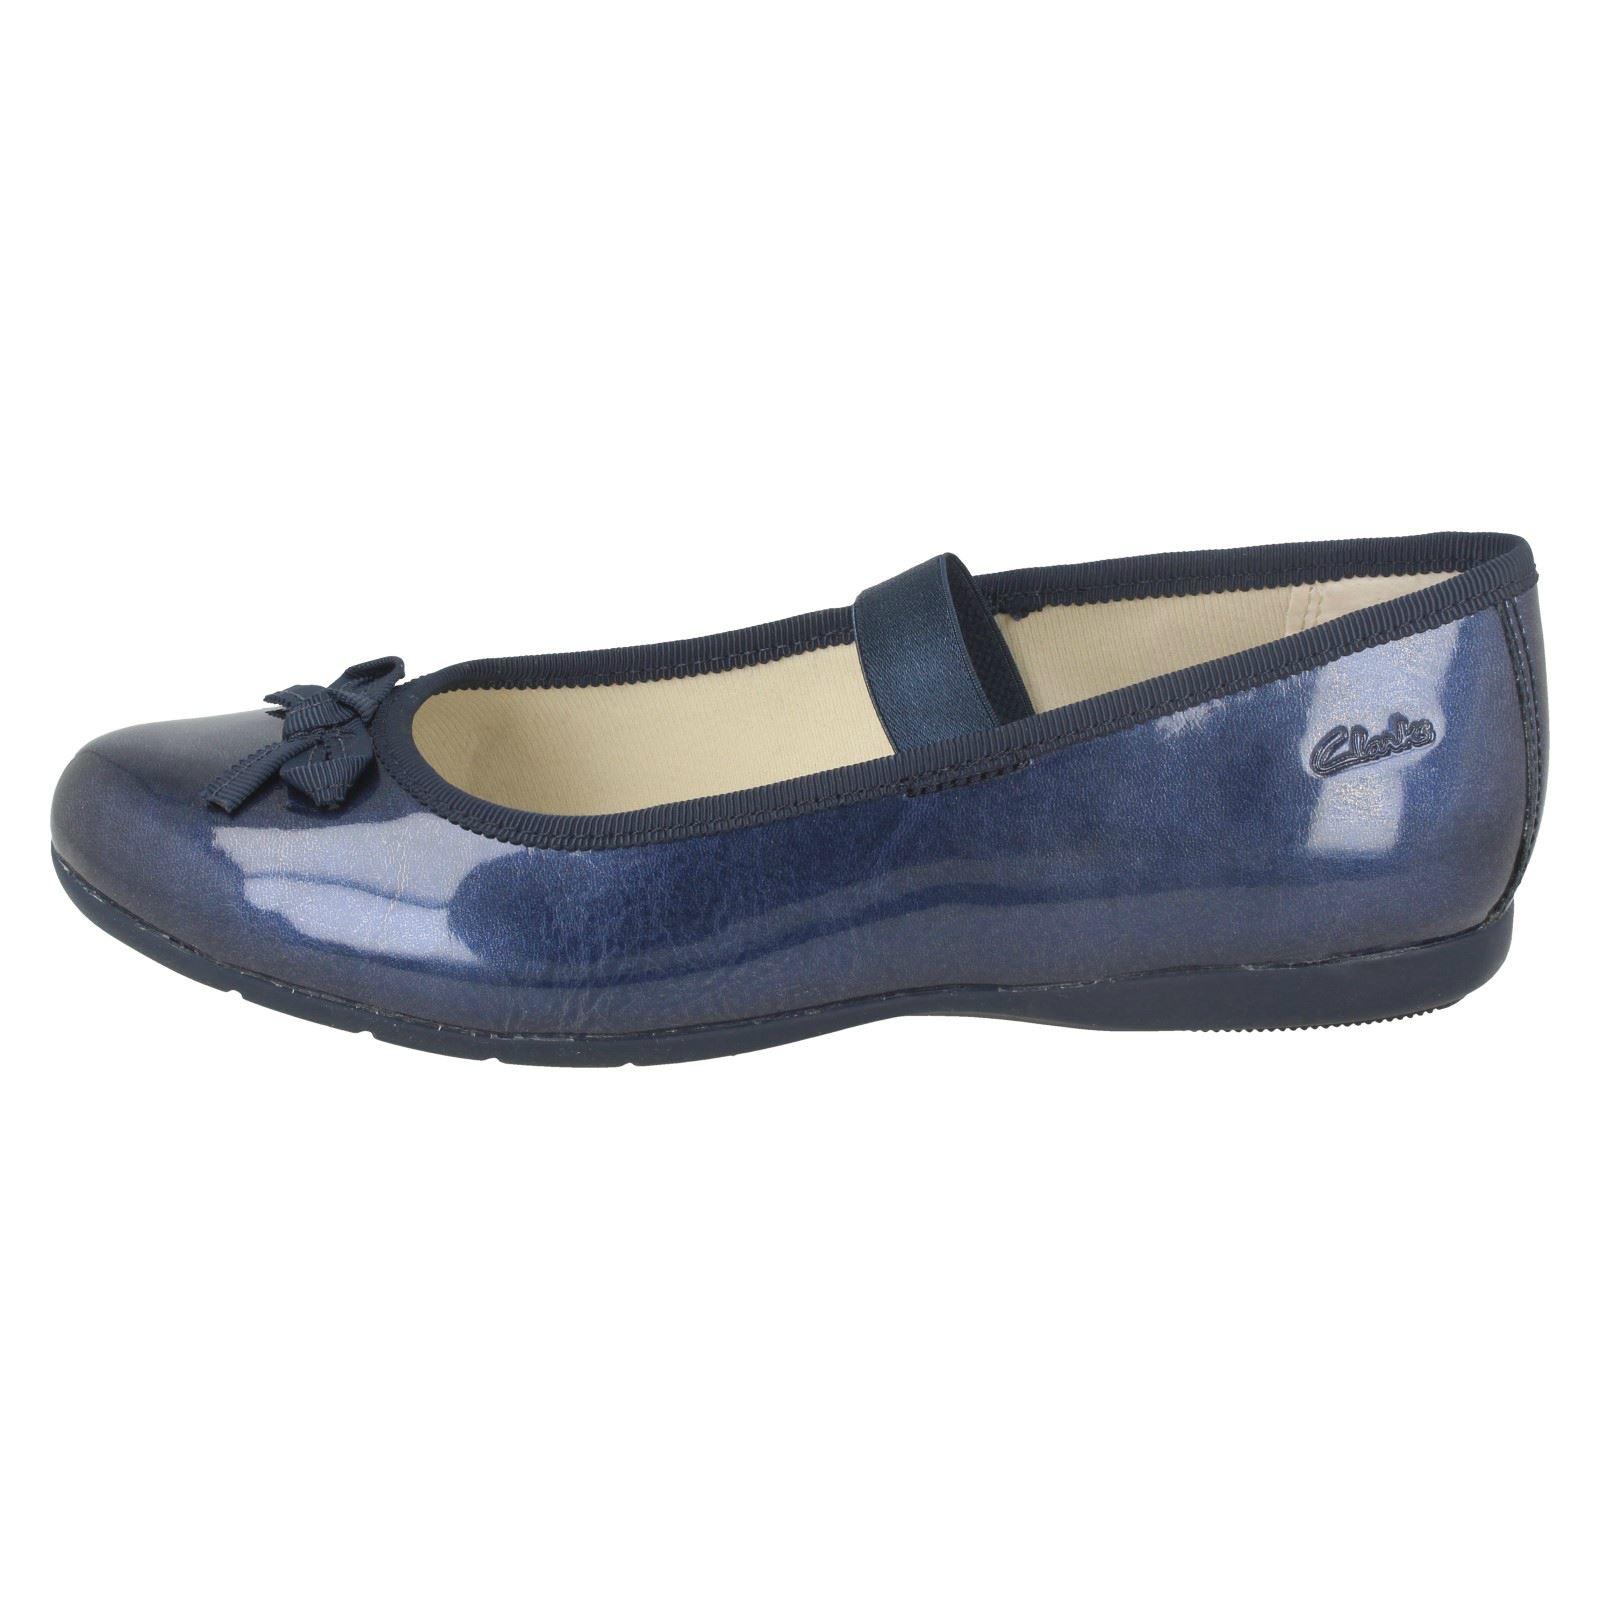 blu Girls Shine Casual Dance Shoes Clarks Navy vY1Rvax